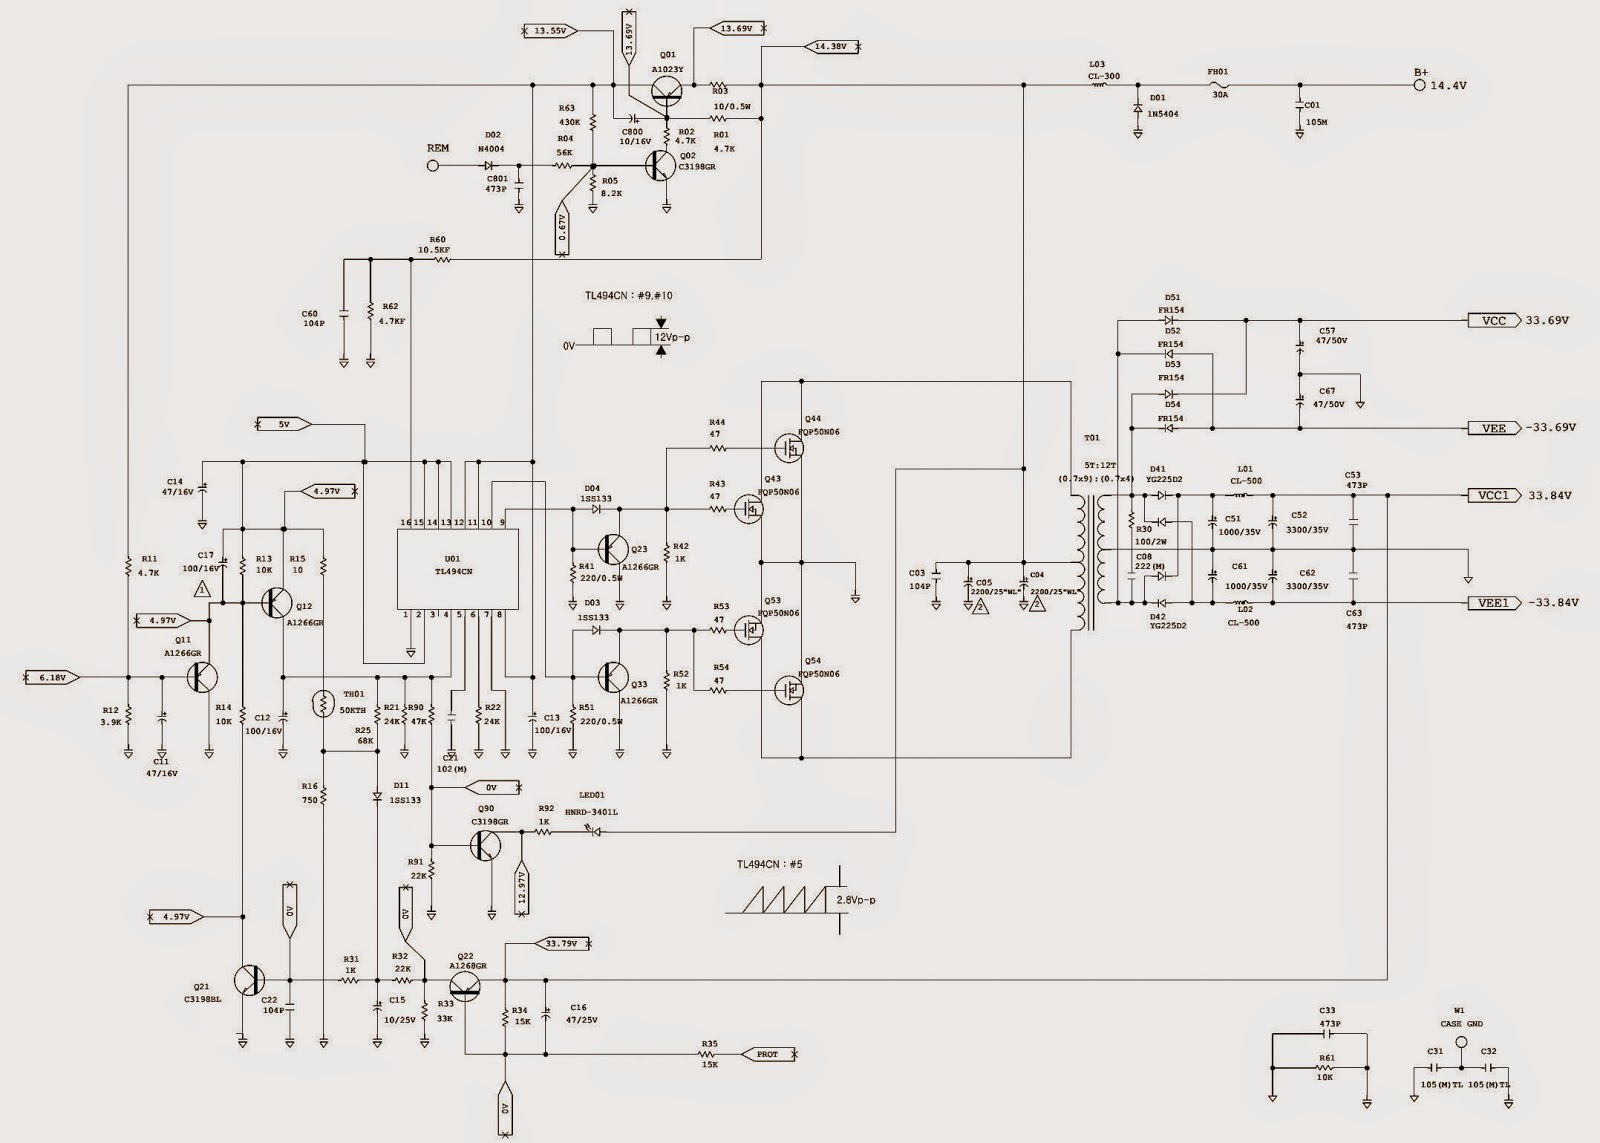 5 Channel Wiring Diagram